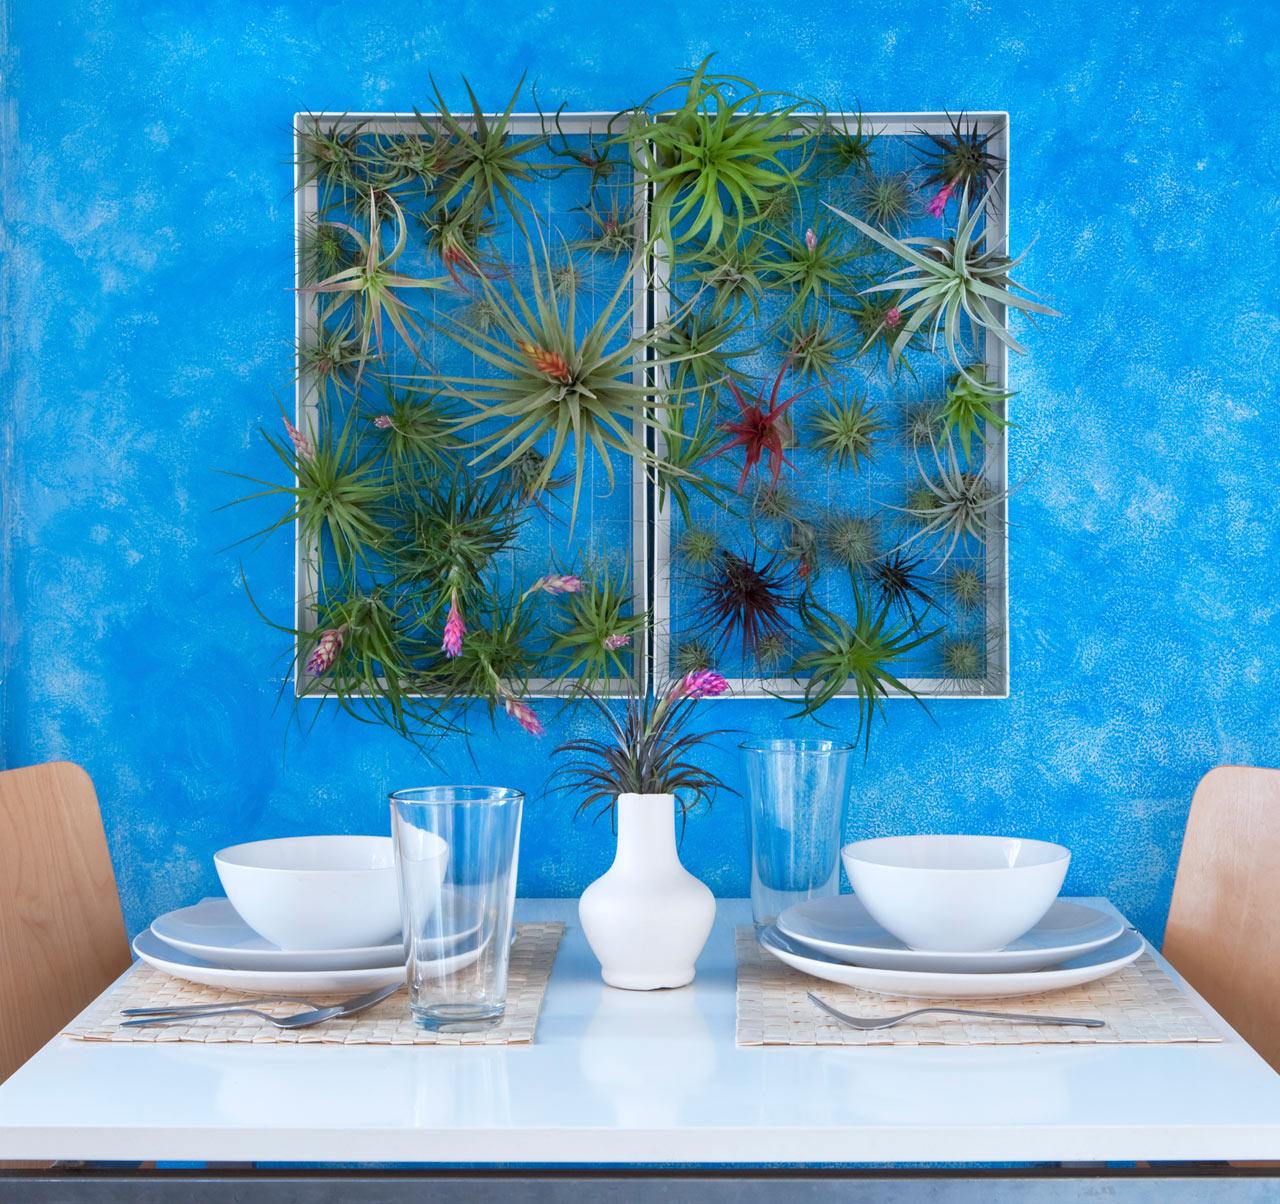 Wall Decor With Plants : Outdoor wall decor ideas frame plants design milk